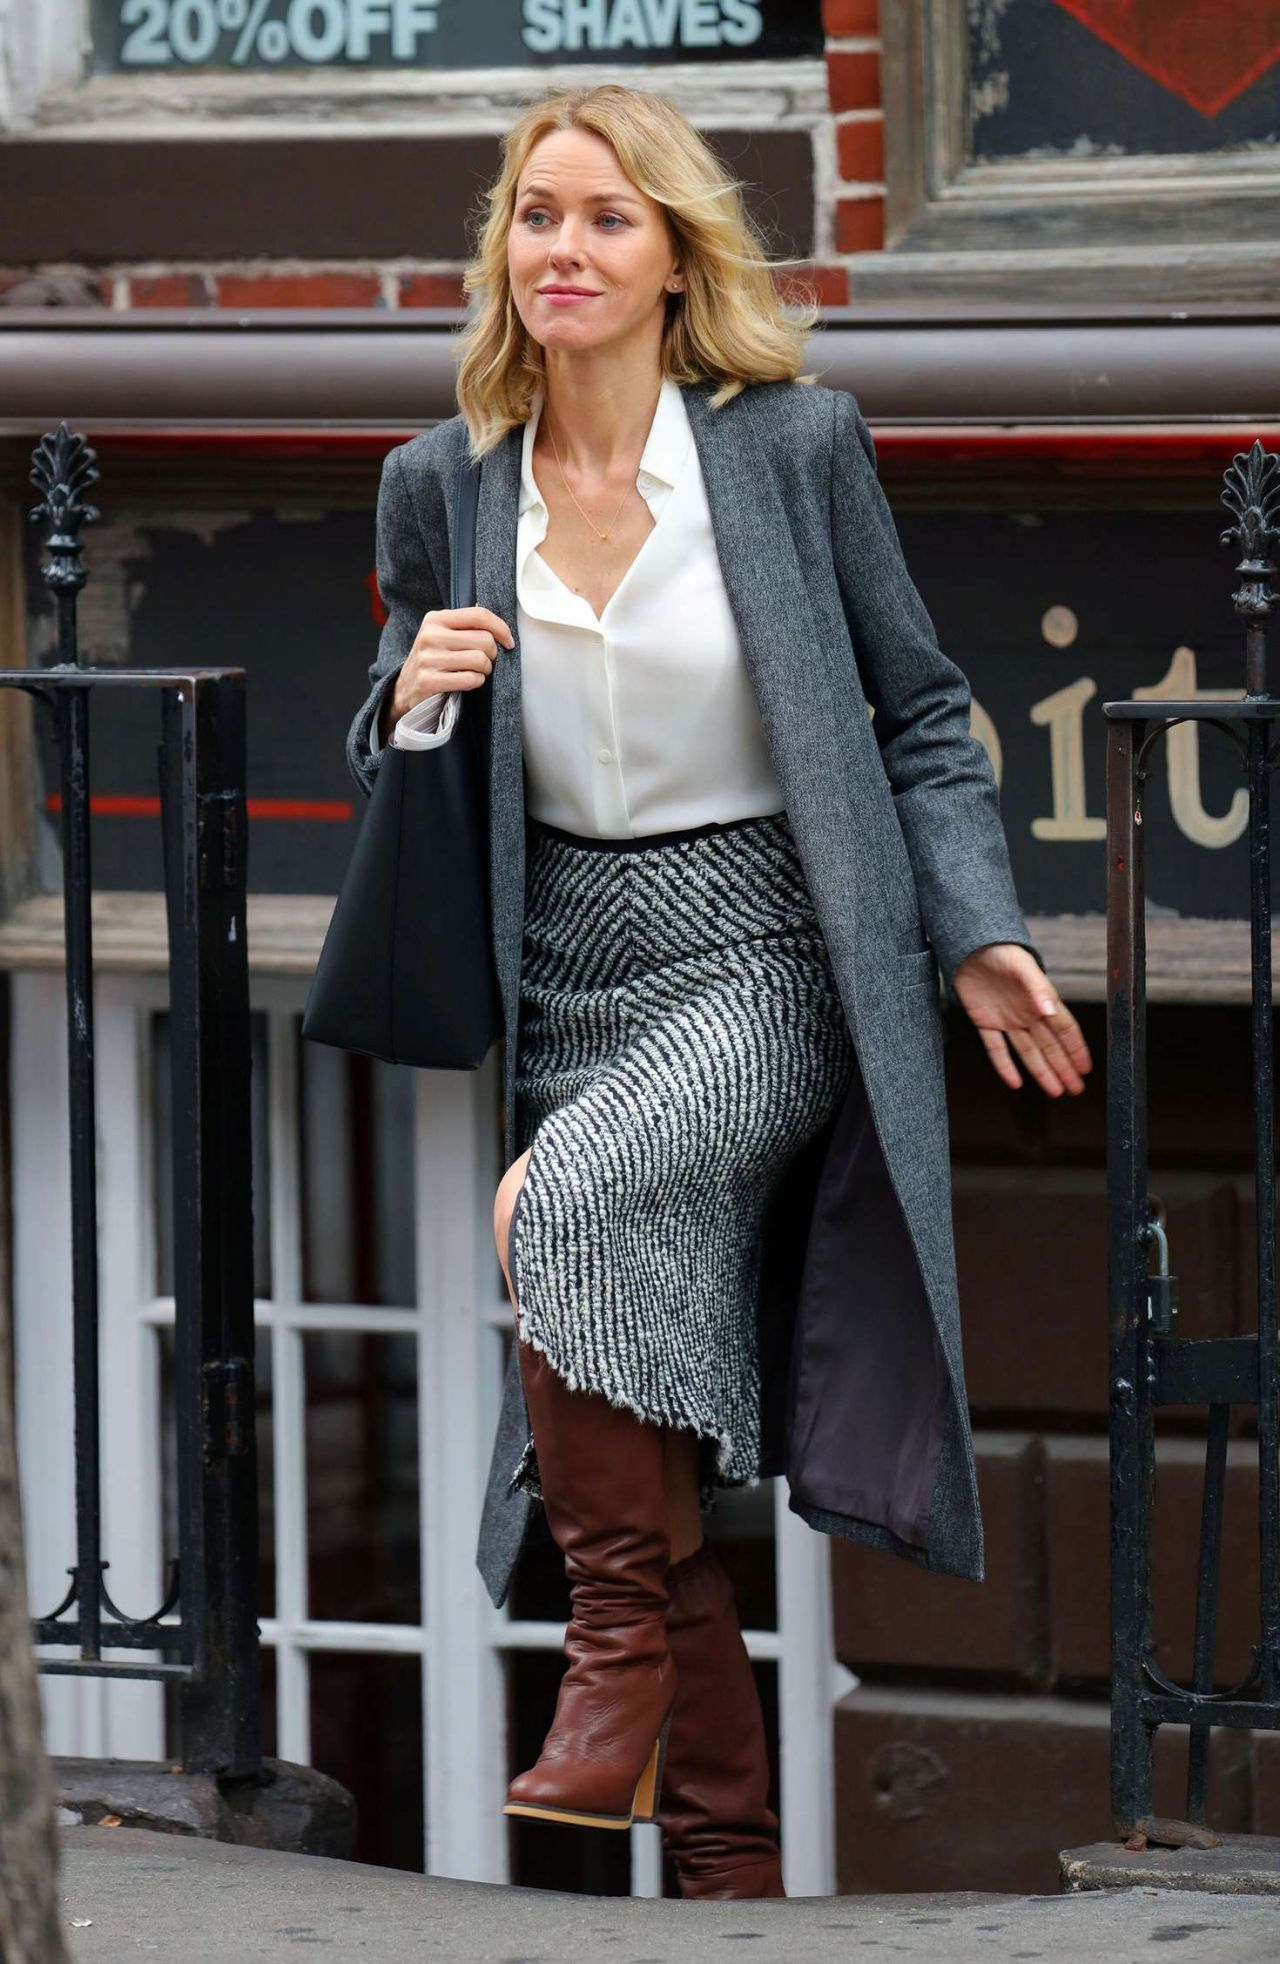 Naomi Watts Style and Fashion Inspirations – NYC 9/28/2016